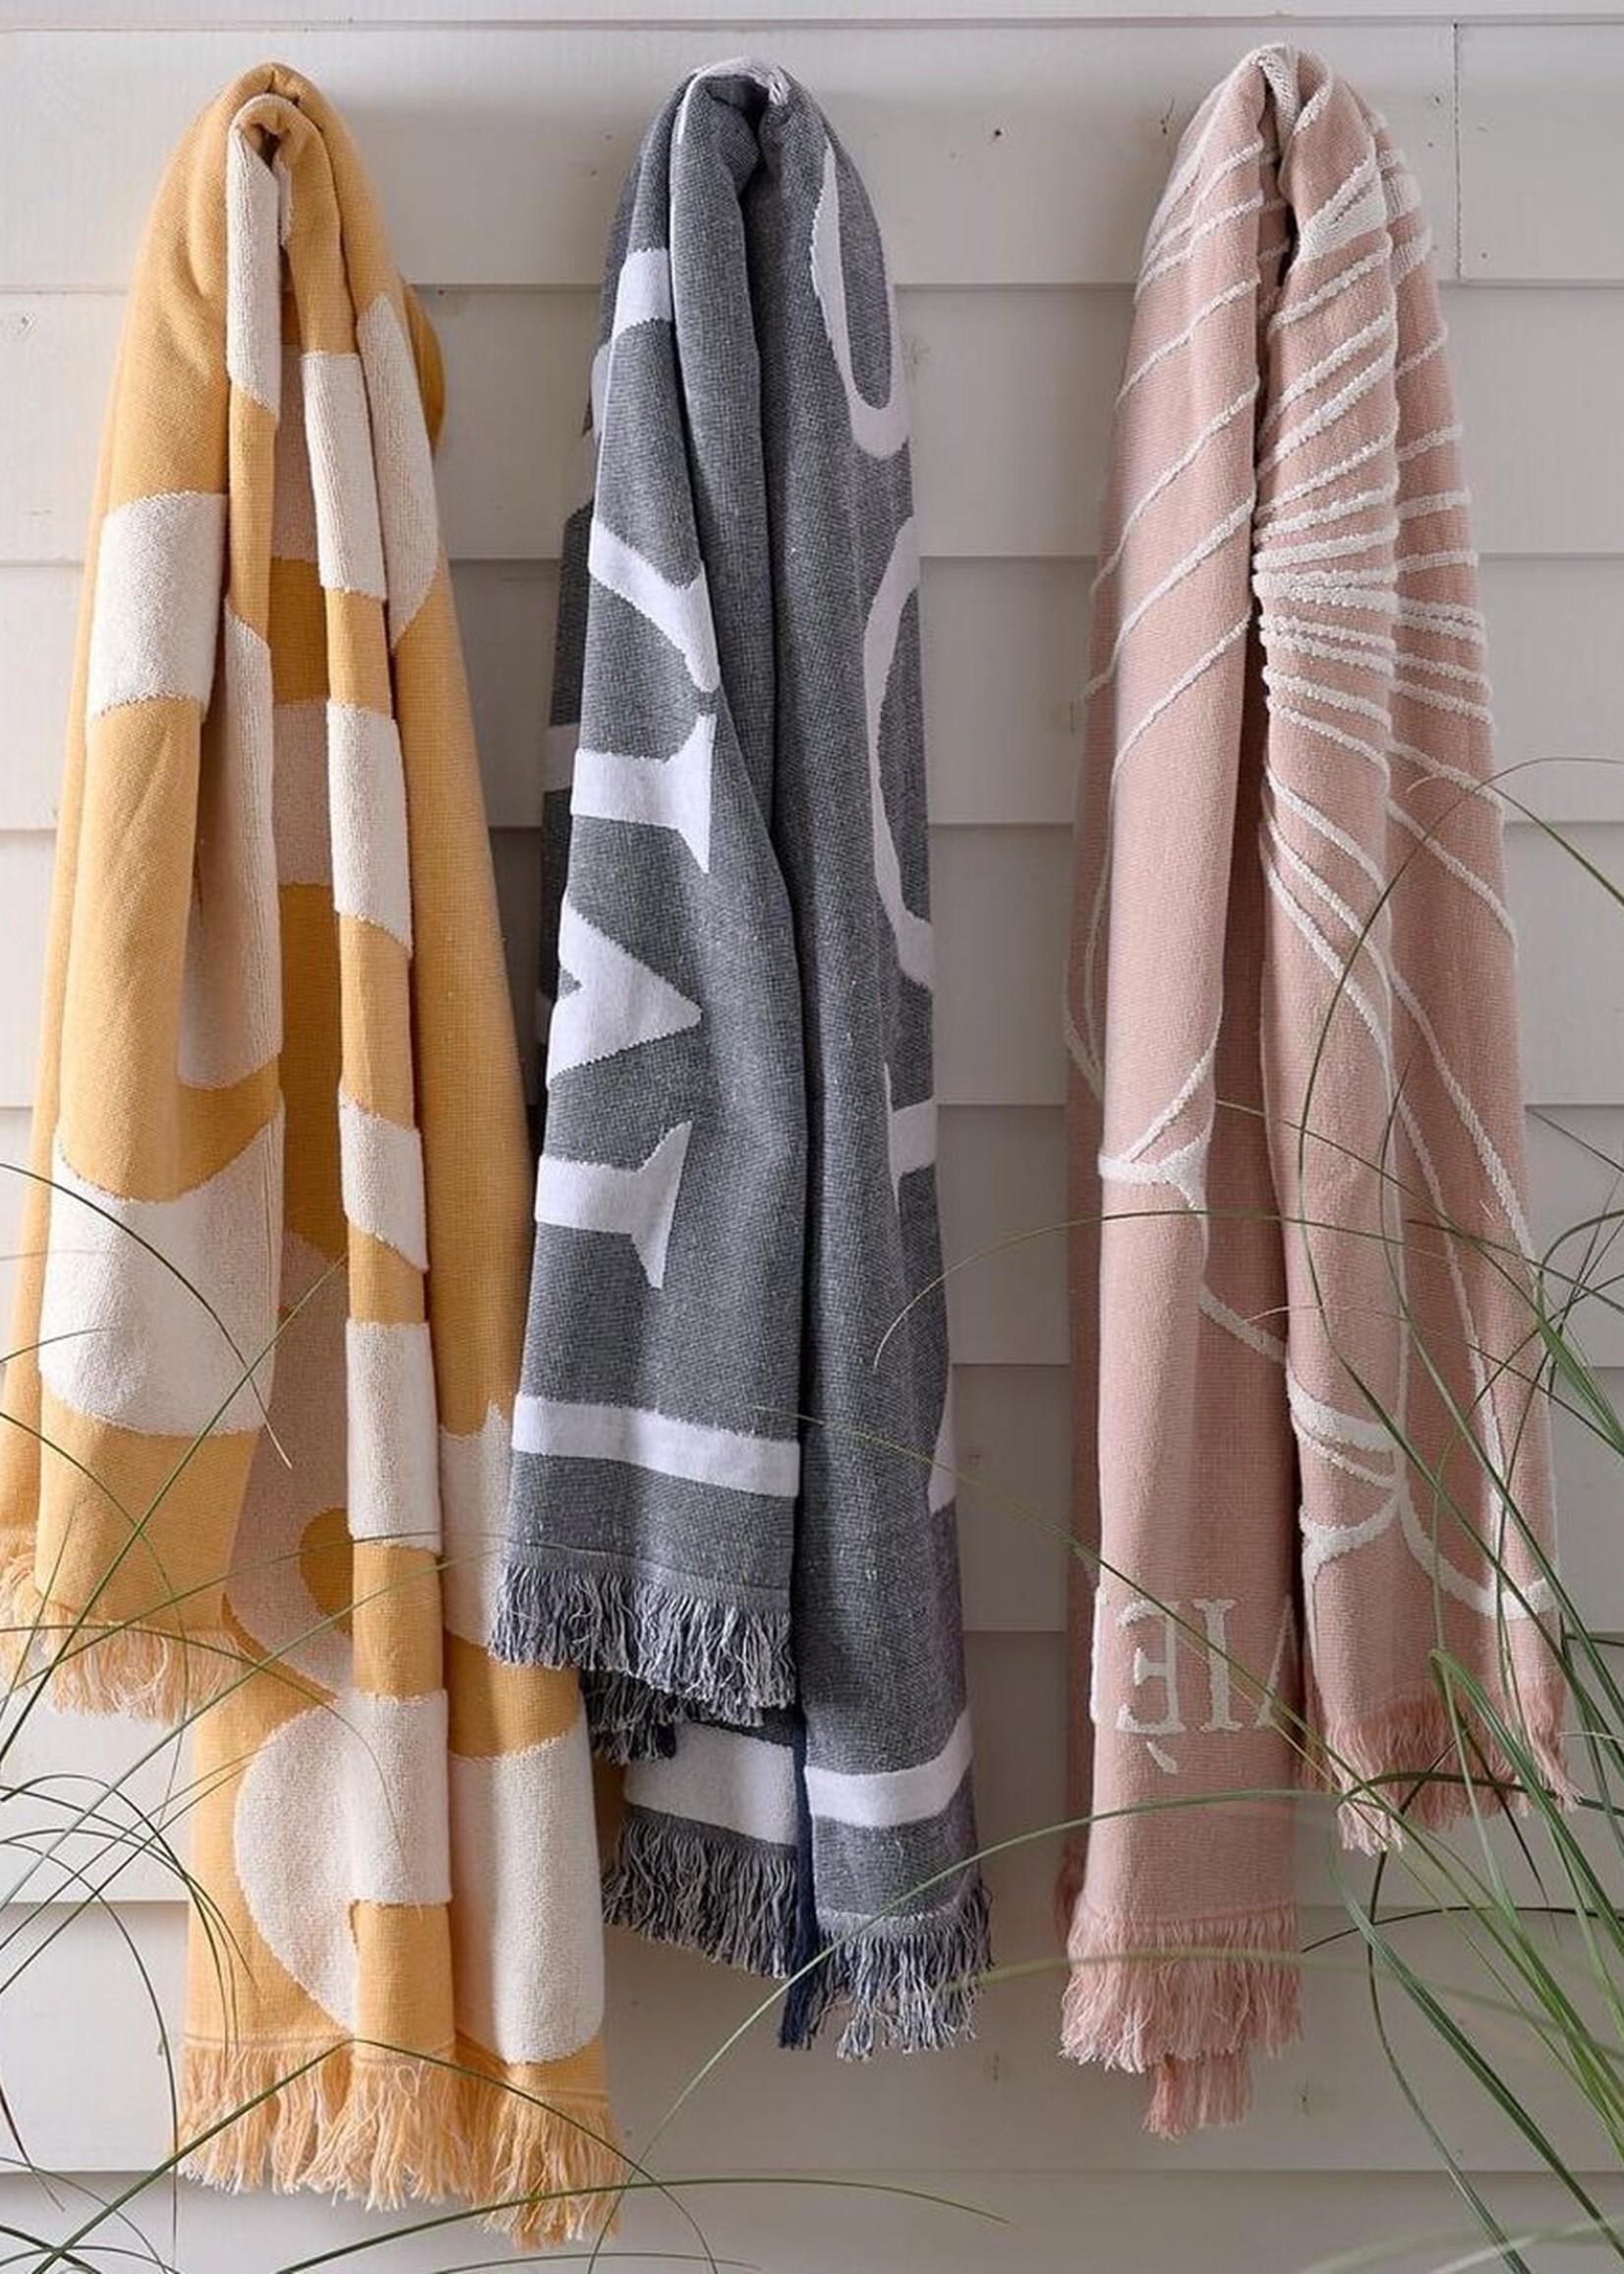 Riviera Maison RM 48 Beach Towel